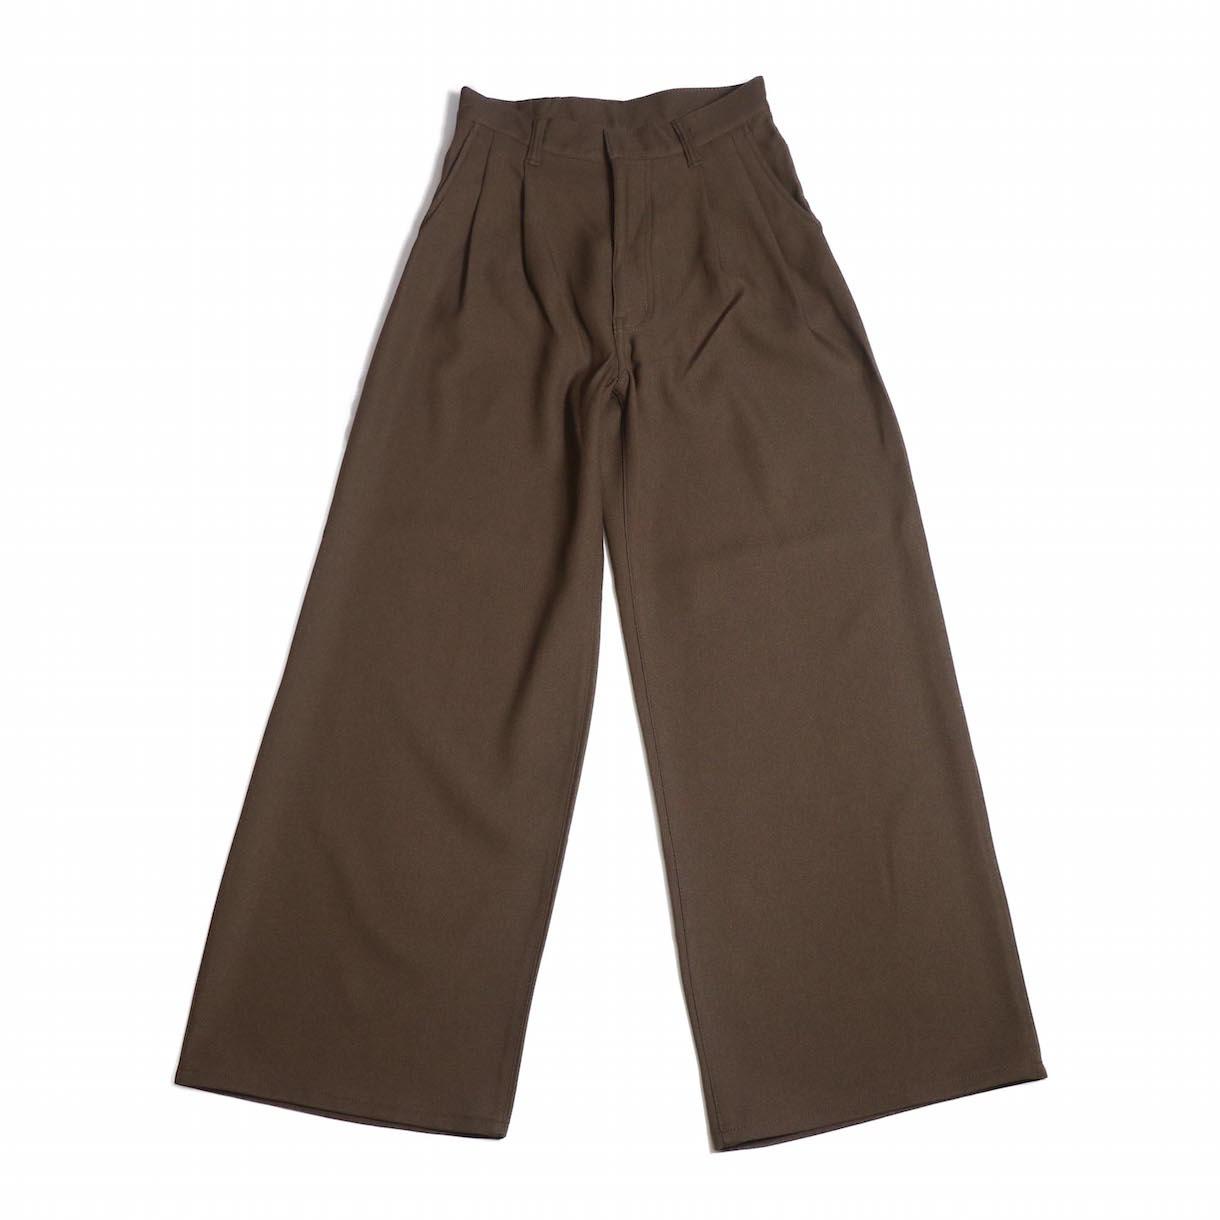 MY _ / STA PREST PANTS- BROWN